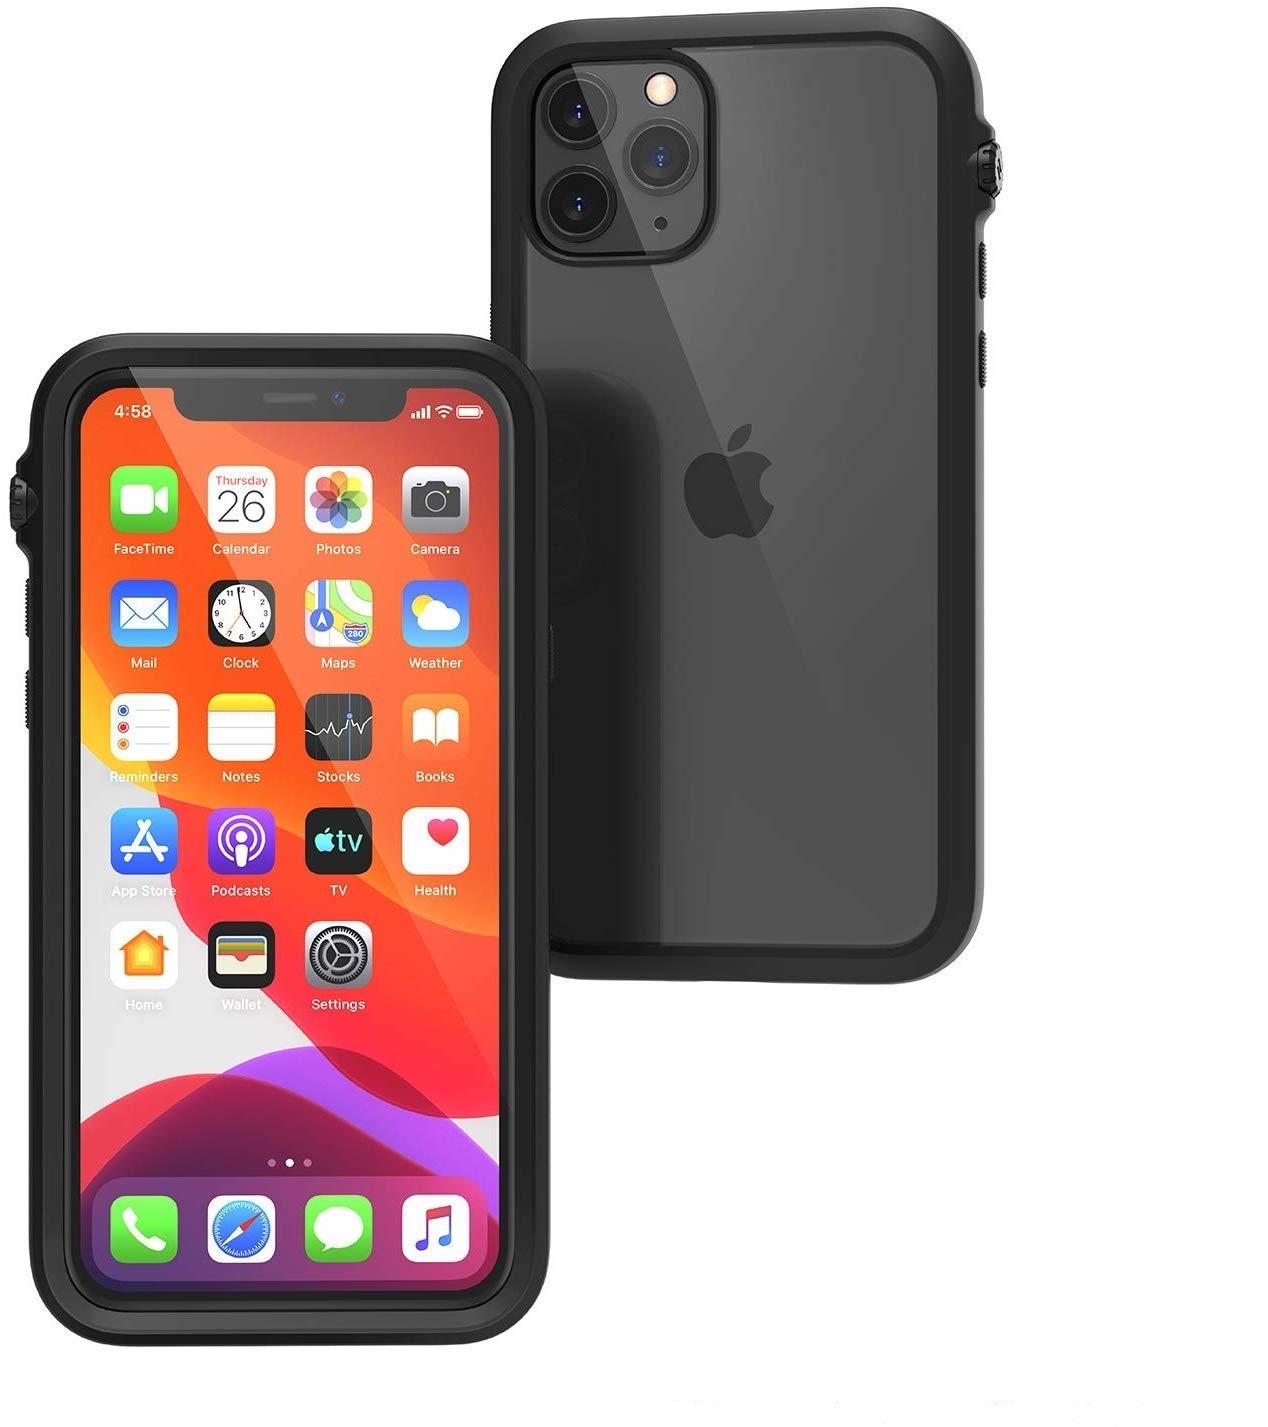 Catalyst Αδιάβροχη Θήκη iPhone 11 Pro - Black (CATIPHO11BLKS)